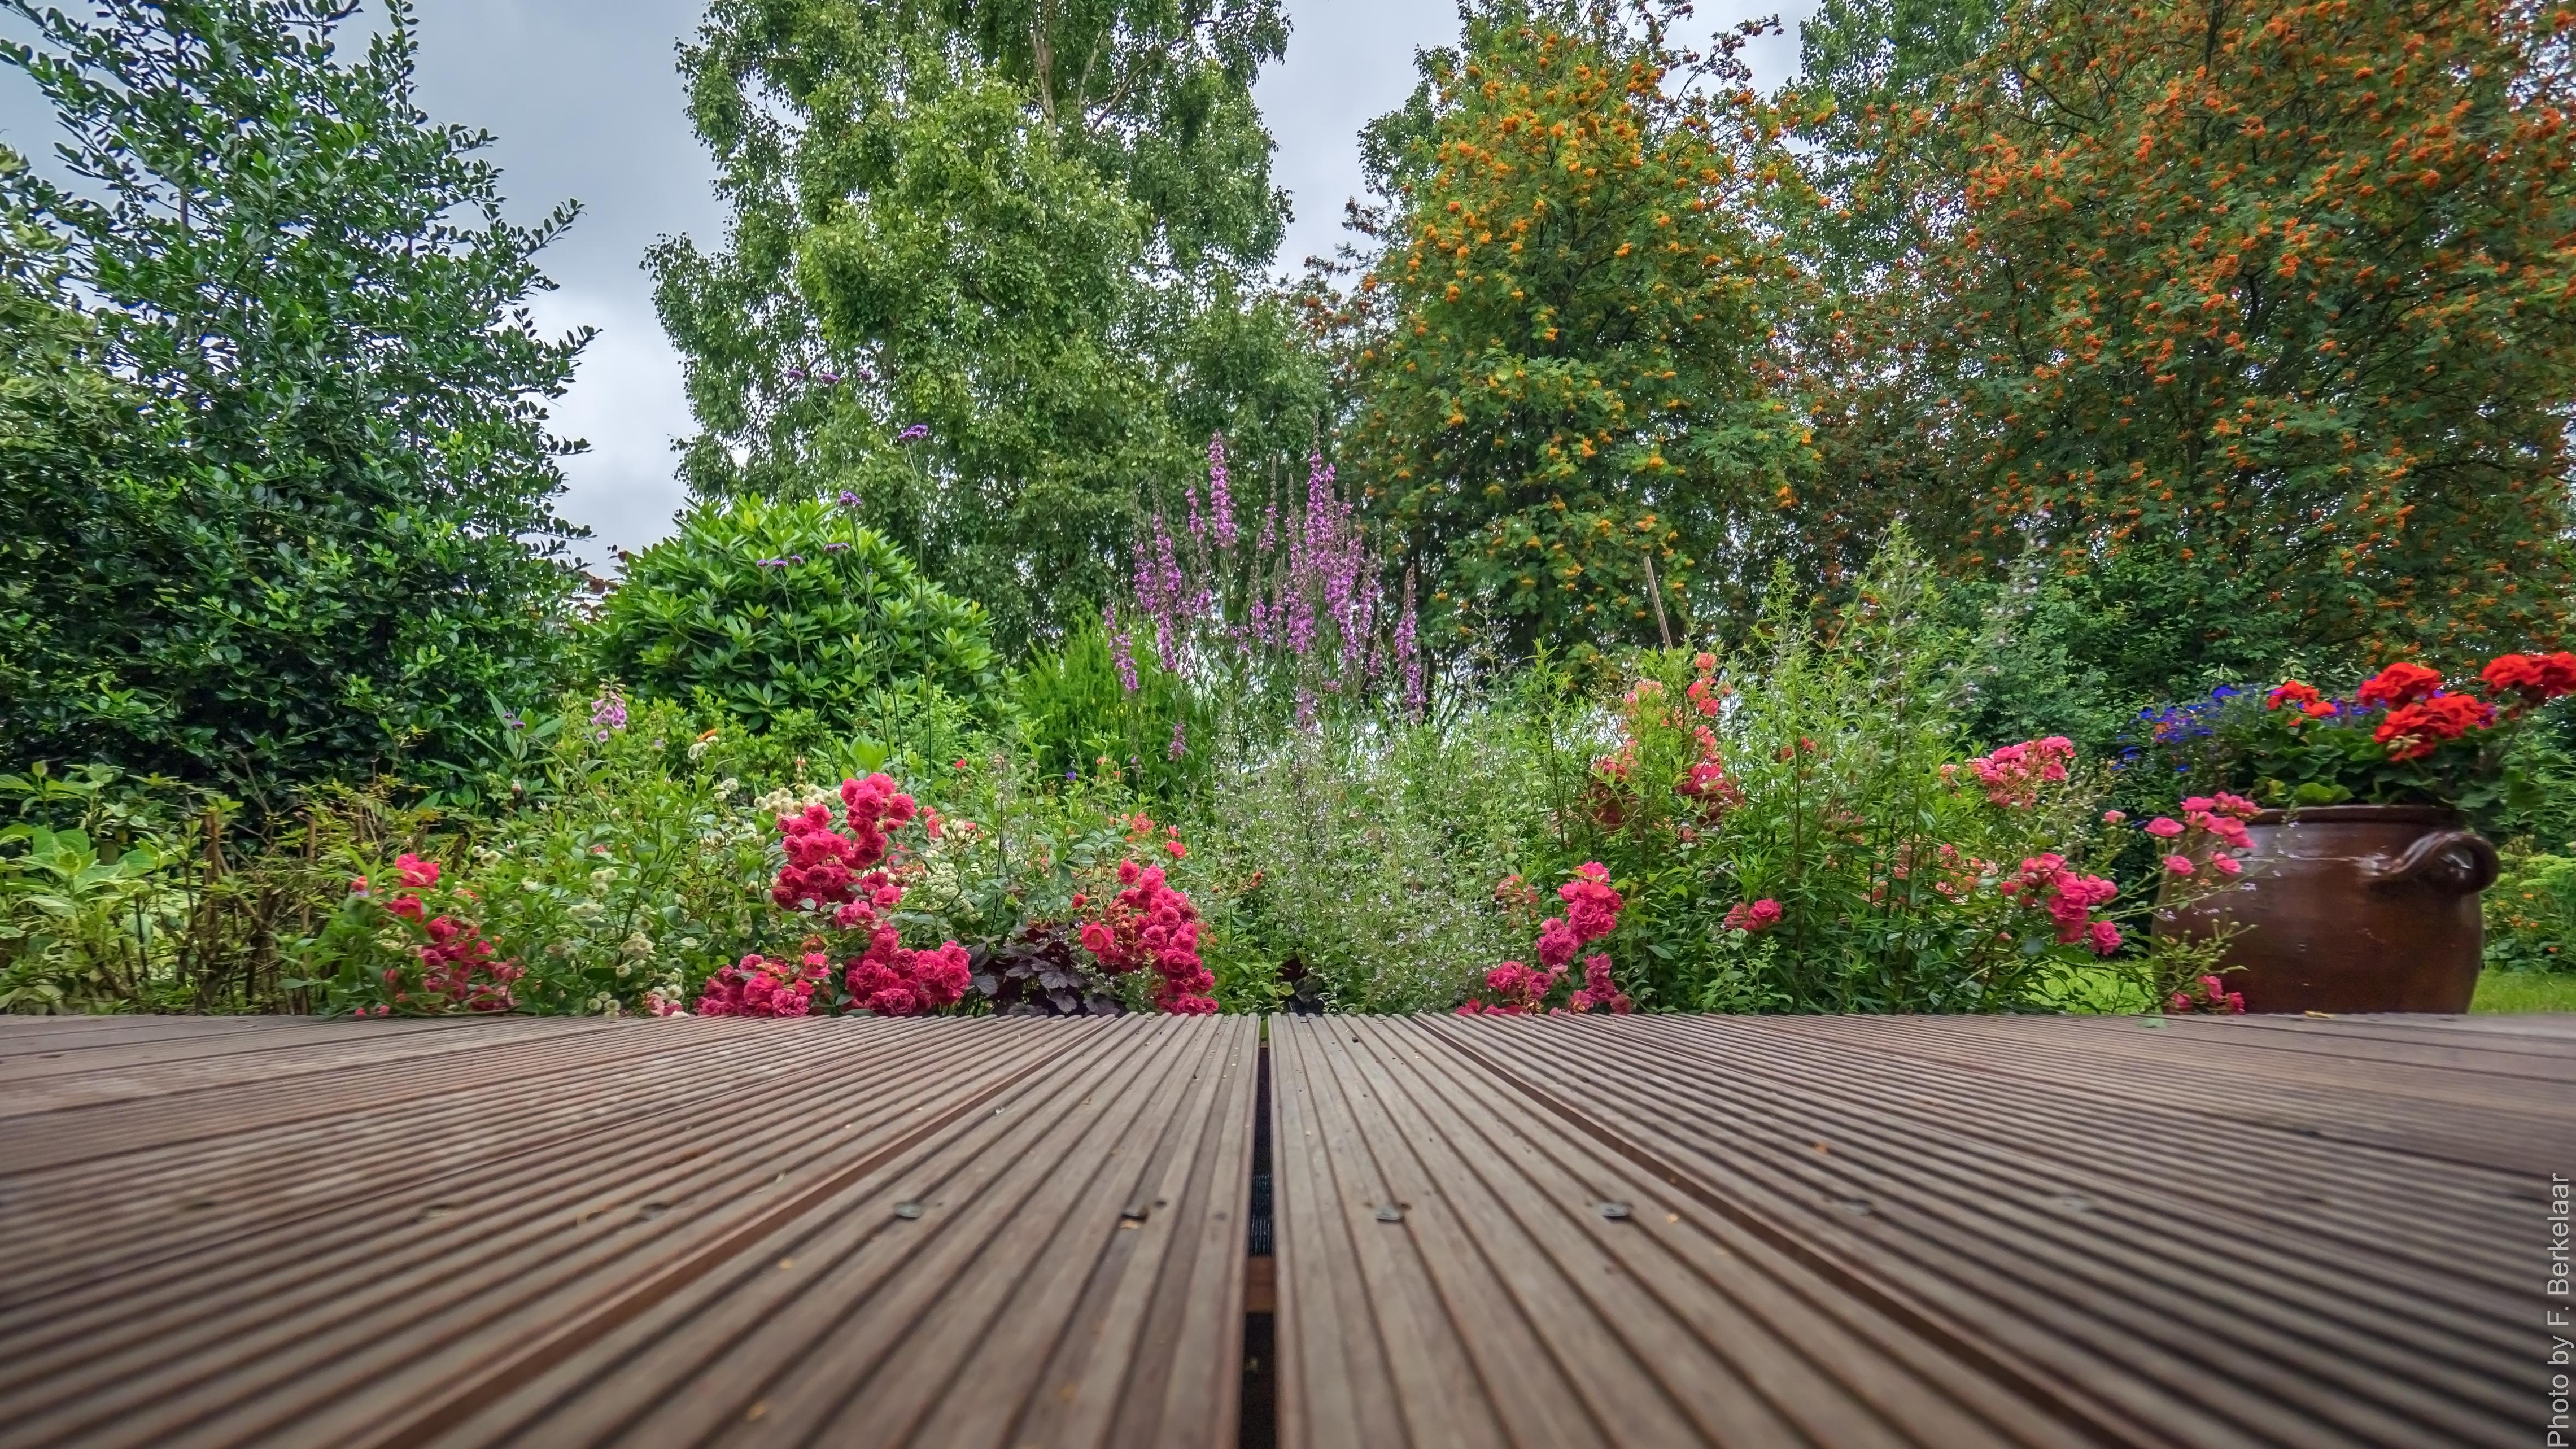 Outdoor Garten free images nature lawn flower walkway backyard botany